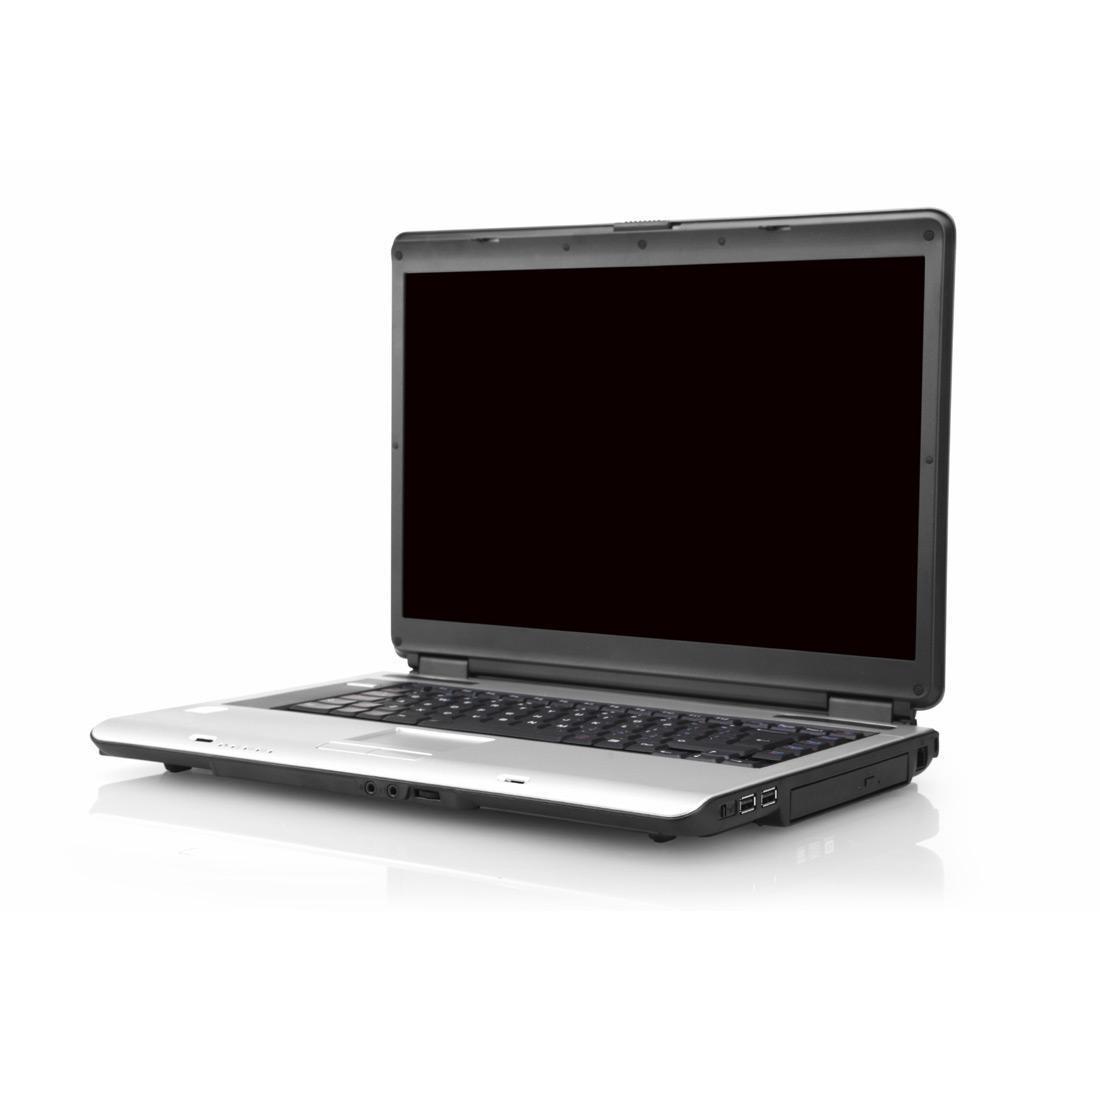 "Sony VAIO 11.1"" Notebook PC"